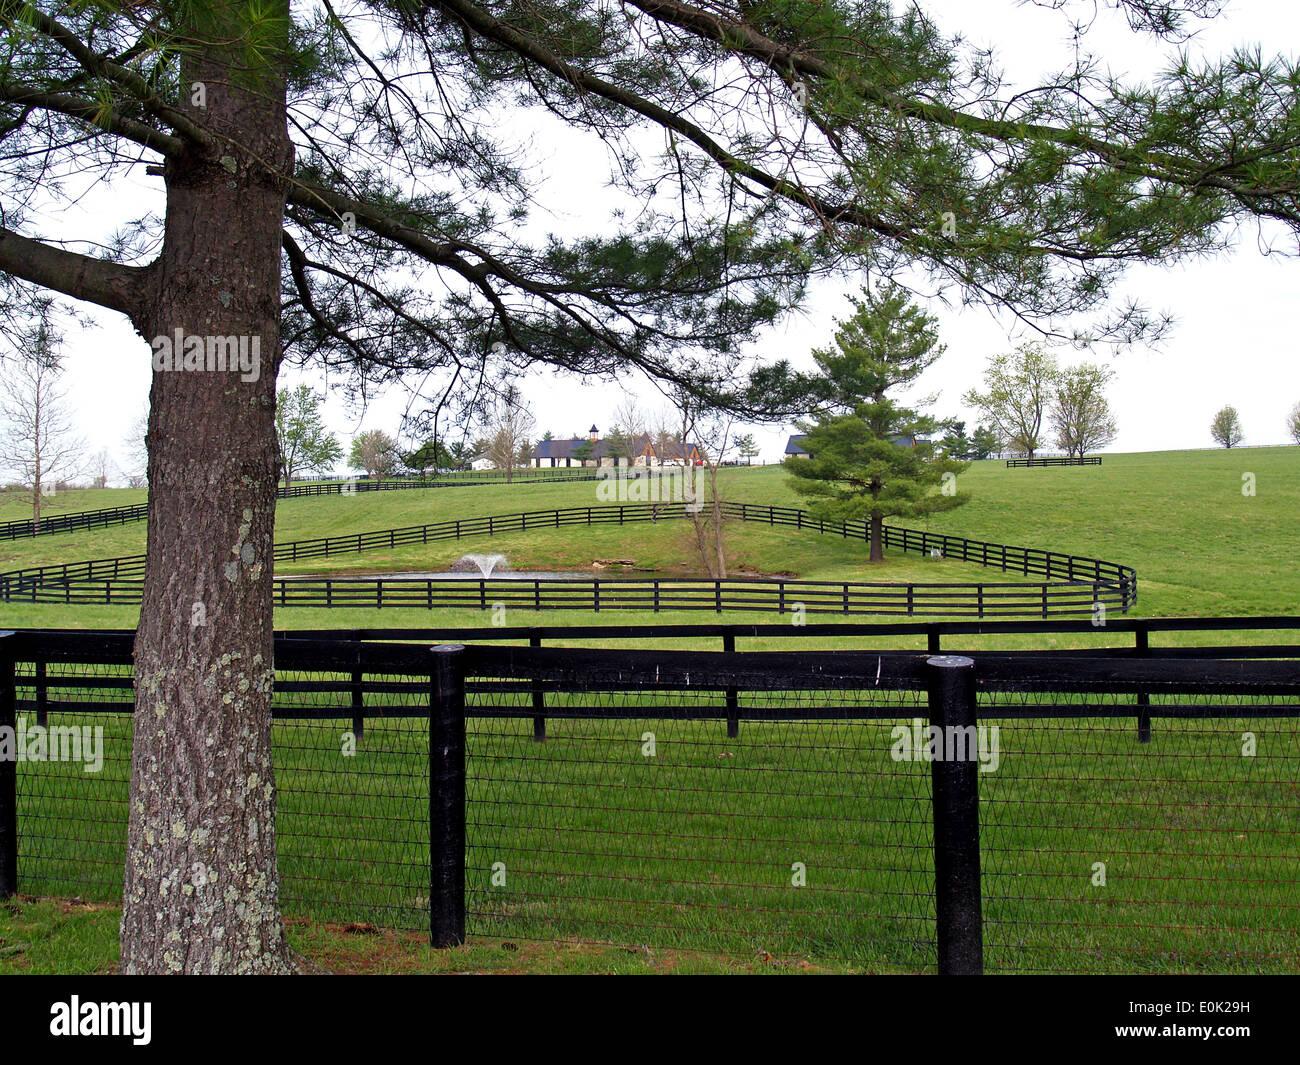 A Thoroughbred farm with black fences outside of Lexington,Kentucky - Stock Image